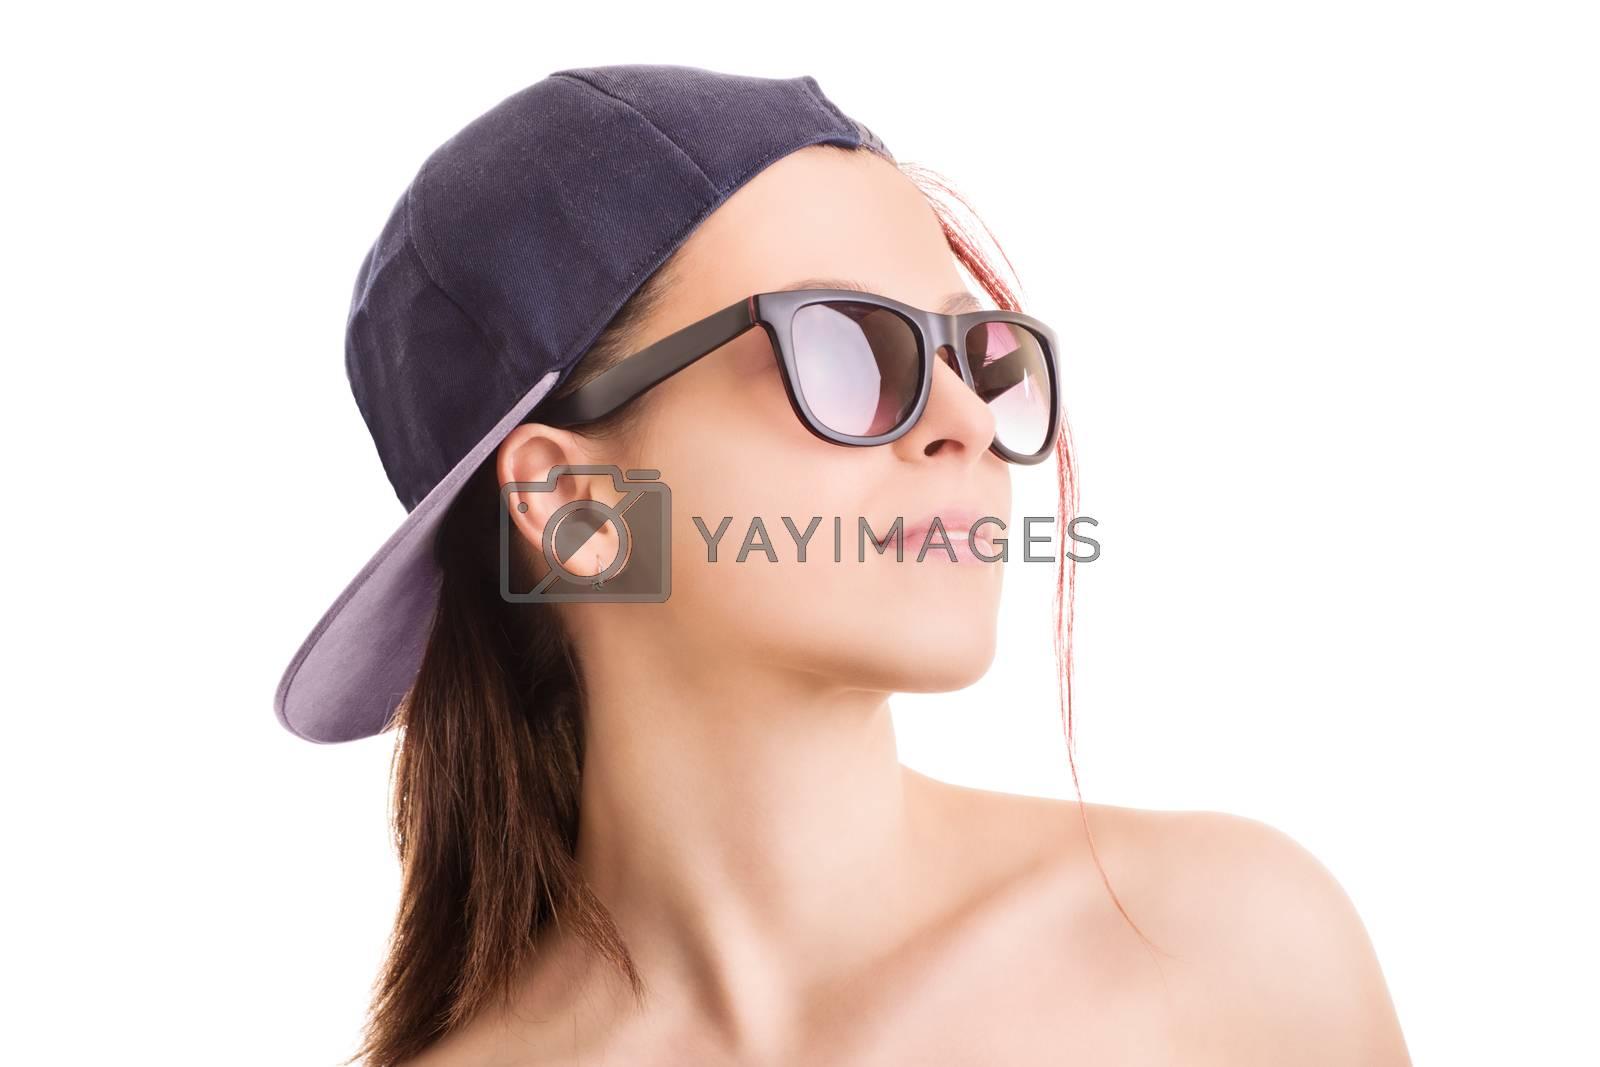 Profile shot of a beautiful stylish girl with backwards snapback cap and sunglasses, isolated on white background.